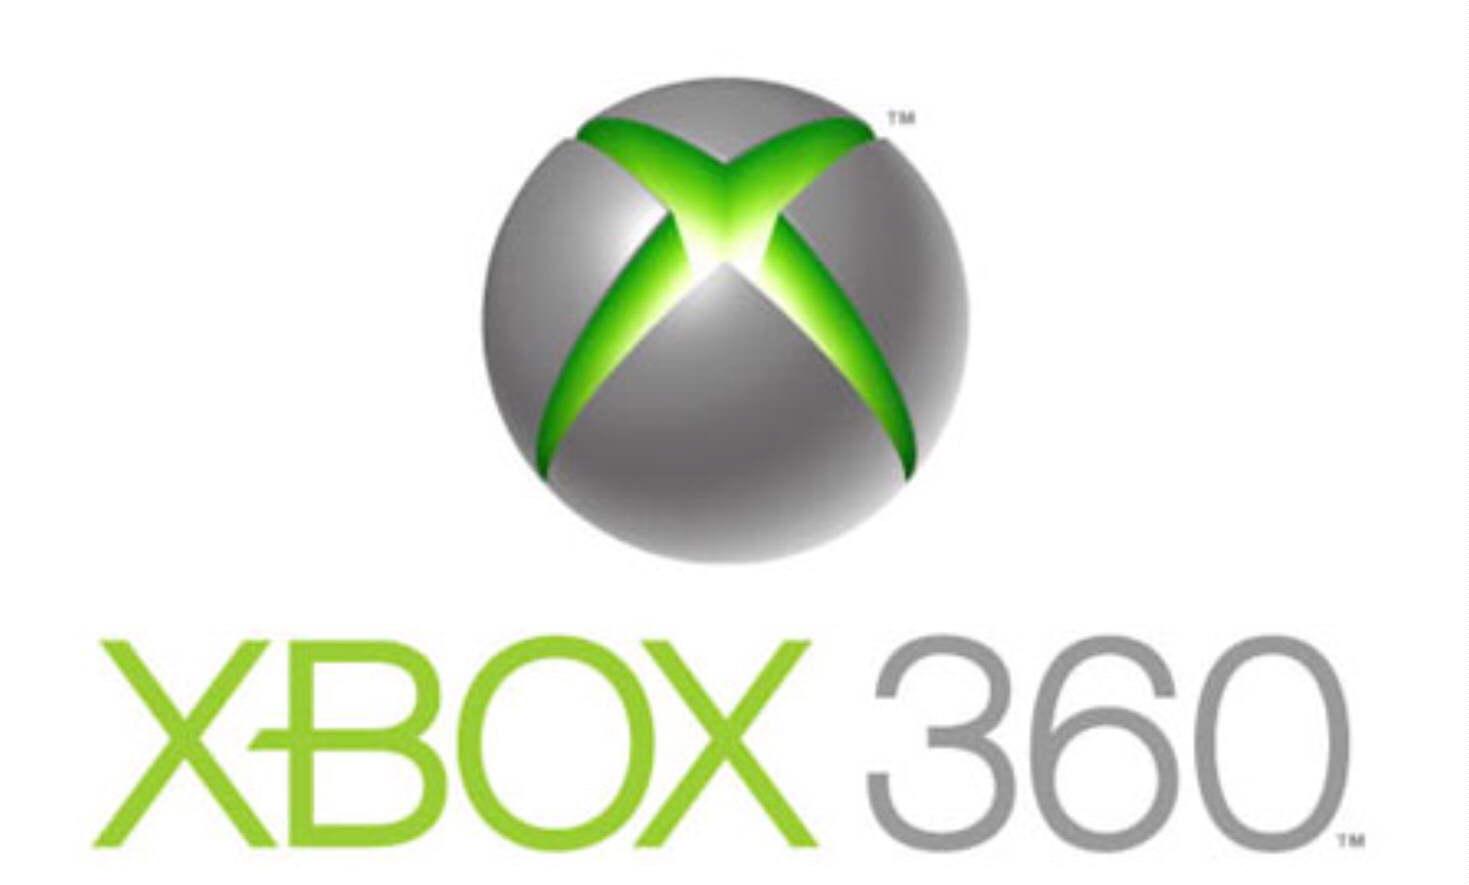 Microsoft X Box 360 Kinect Image